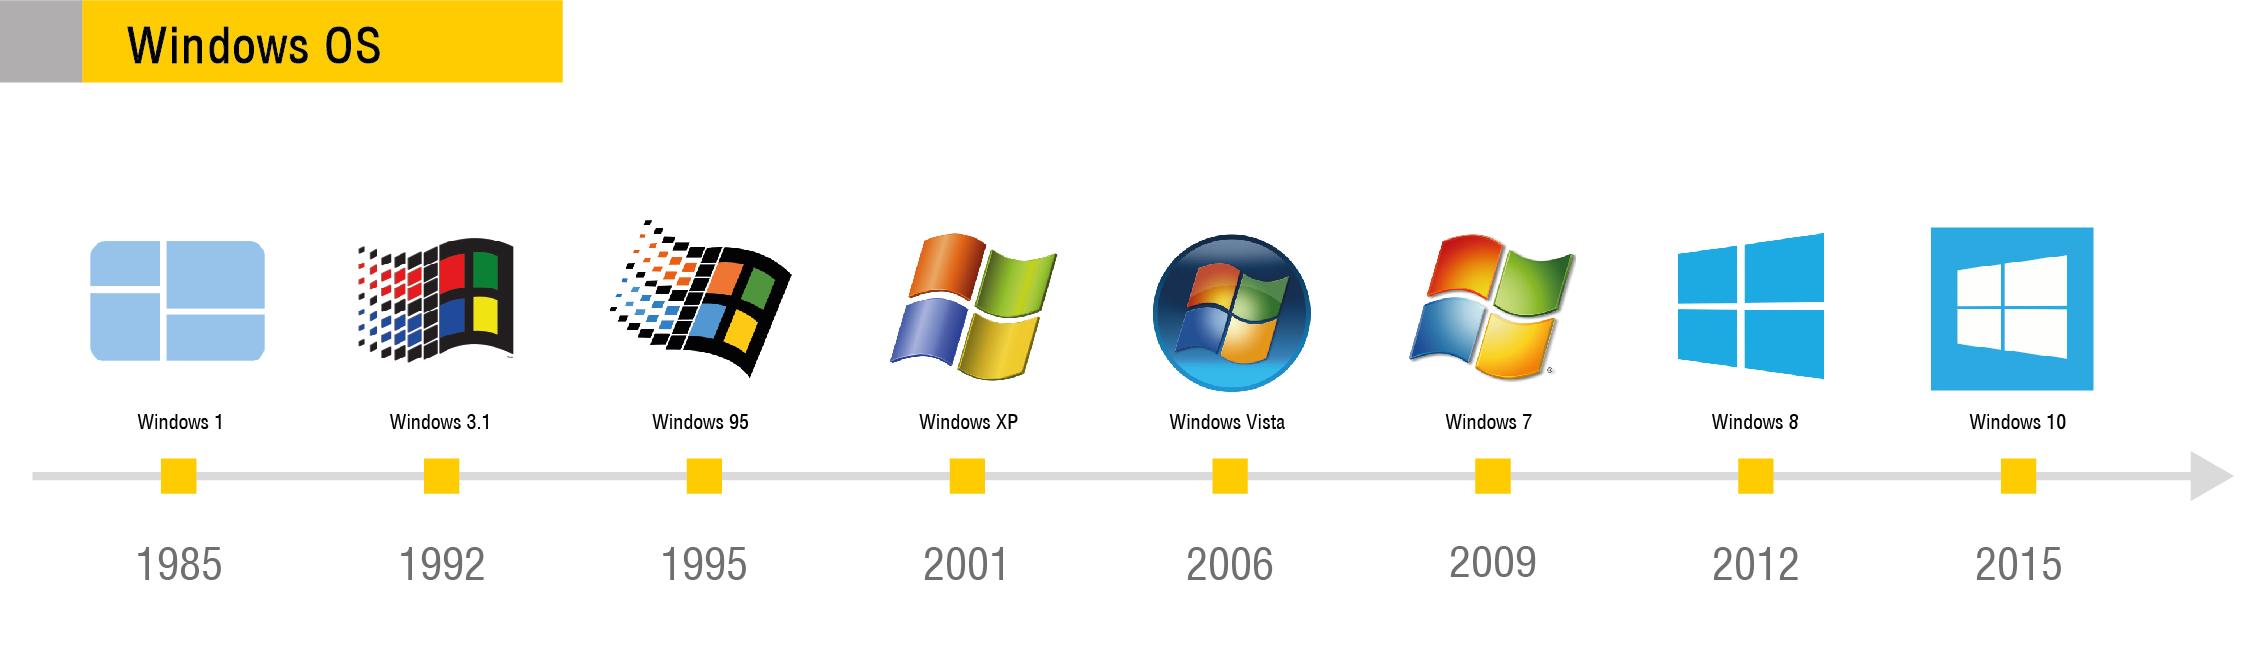 Логотип Windows OS – «почему ты флаг?»